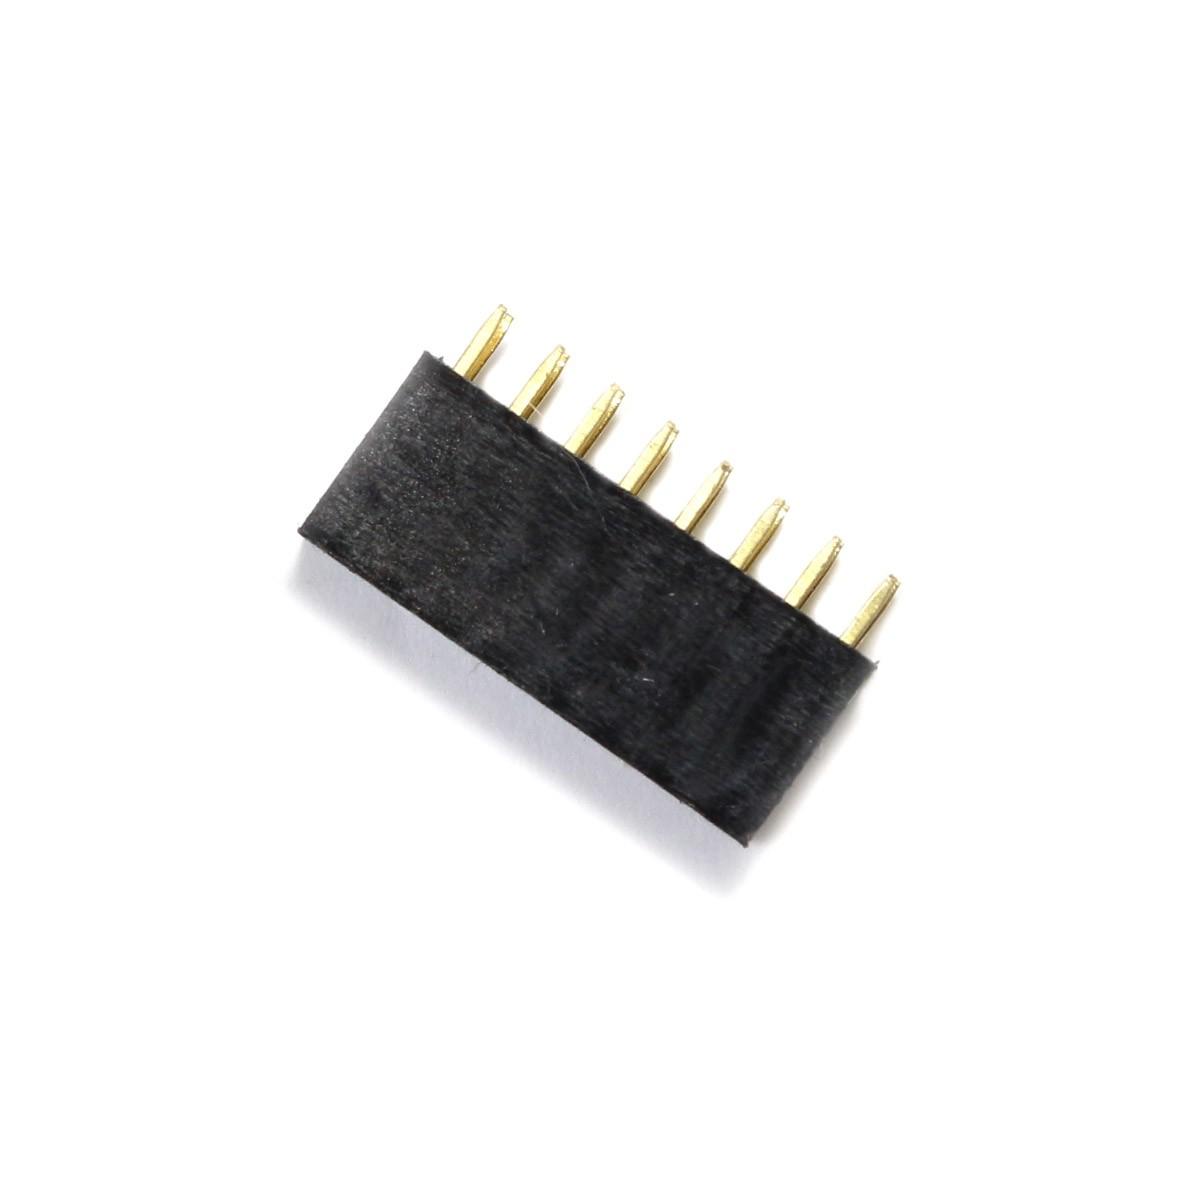 2.54mm Male / Female Pin Header 2x8 Pins 3mm (Unit)